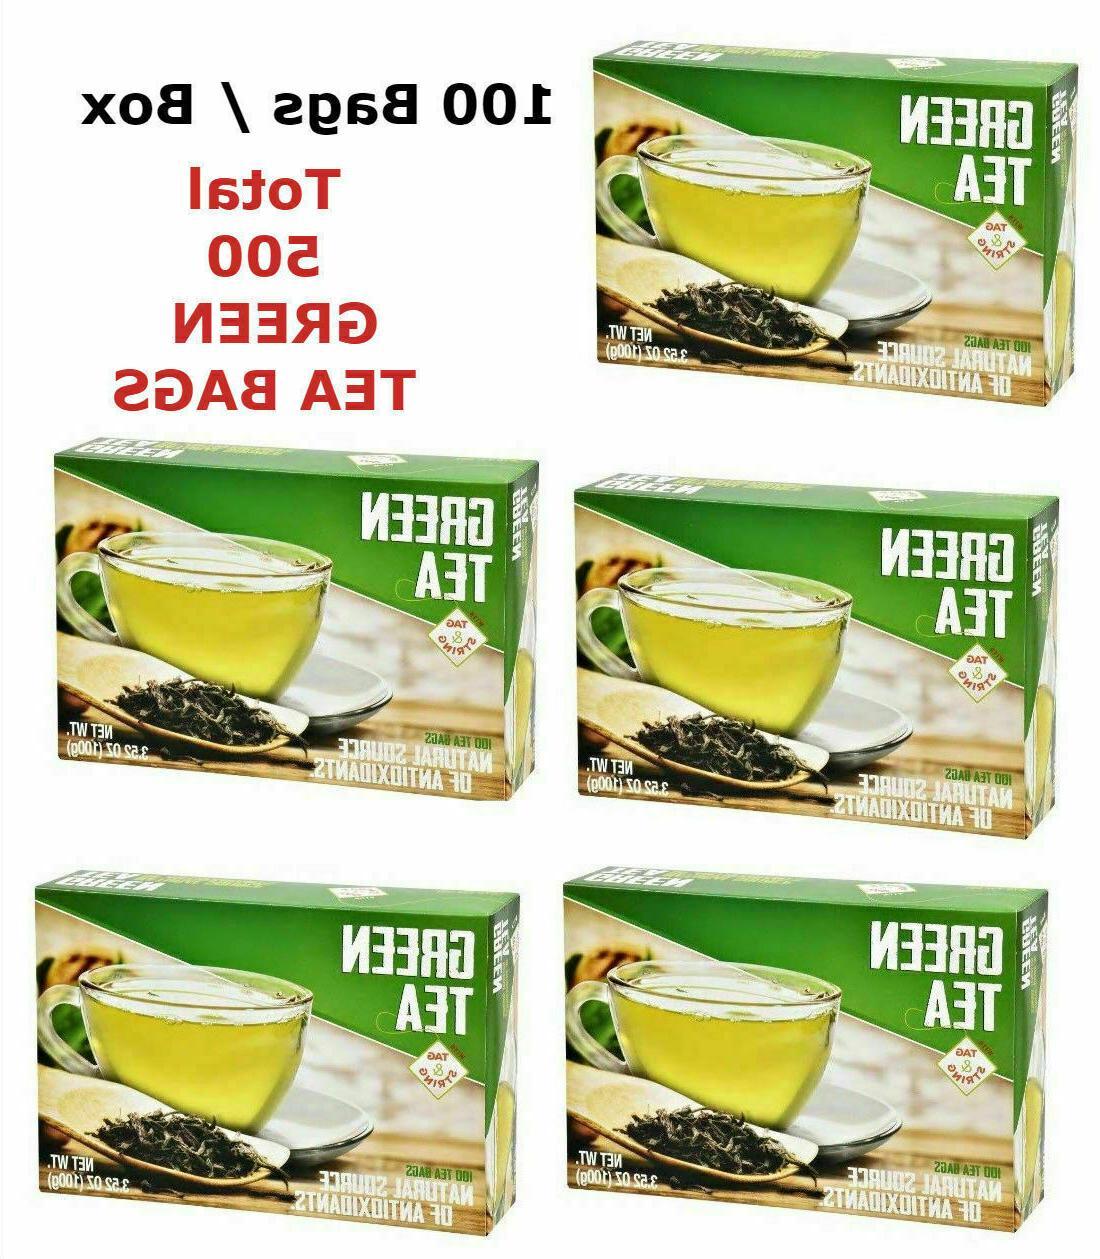 Lot 5 Boxes Green Tea Natural Source Of Antioxidants Bags 10